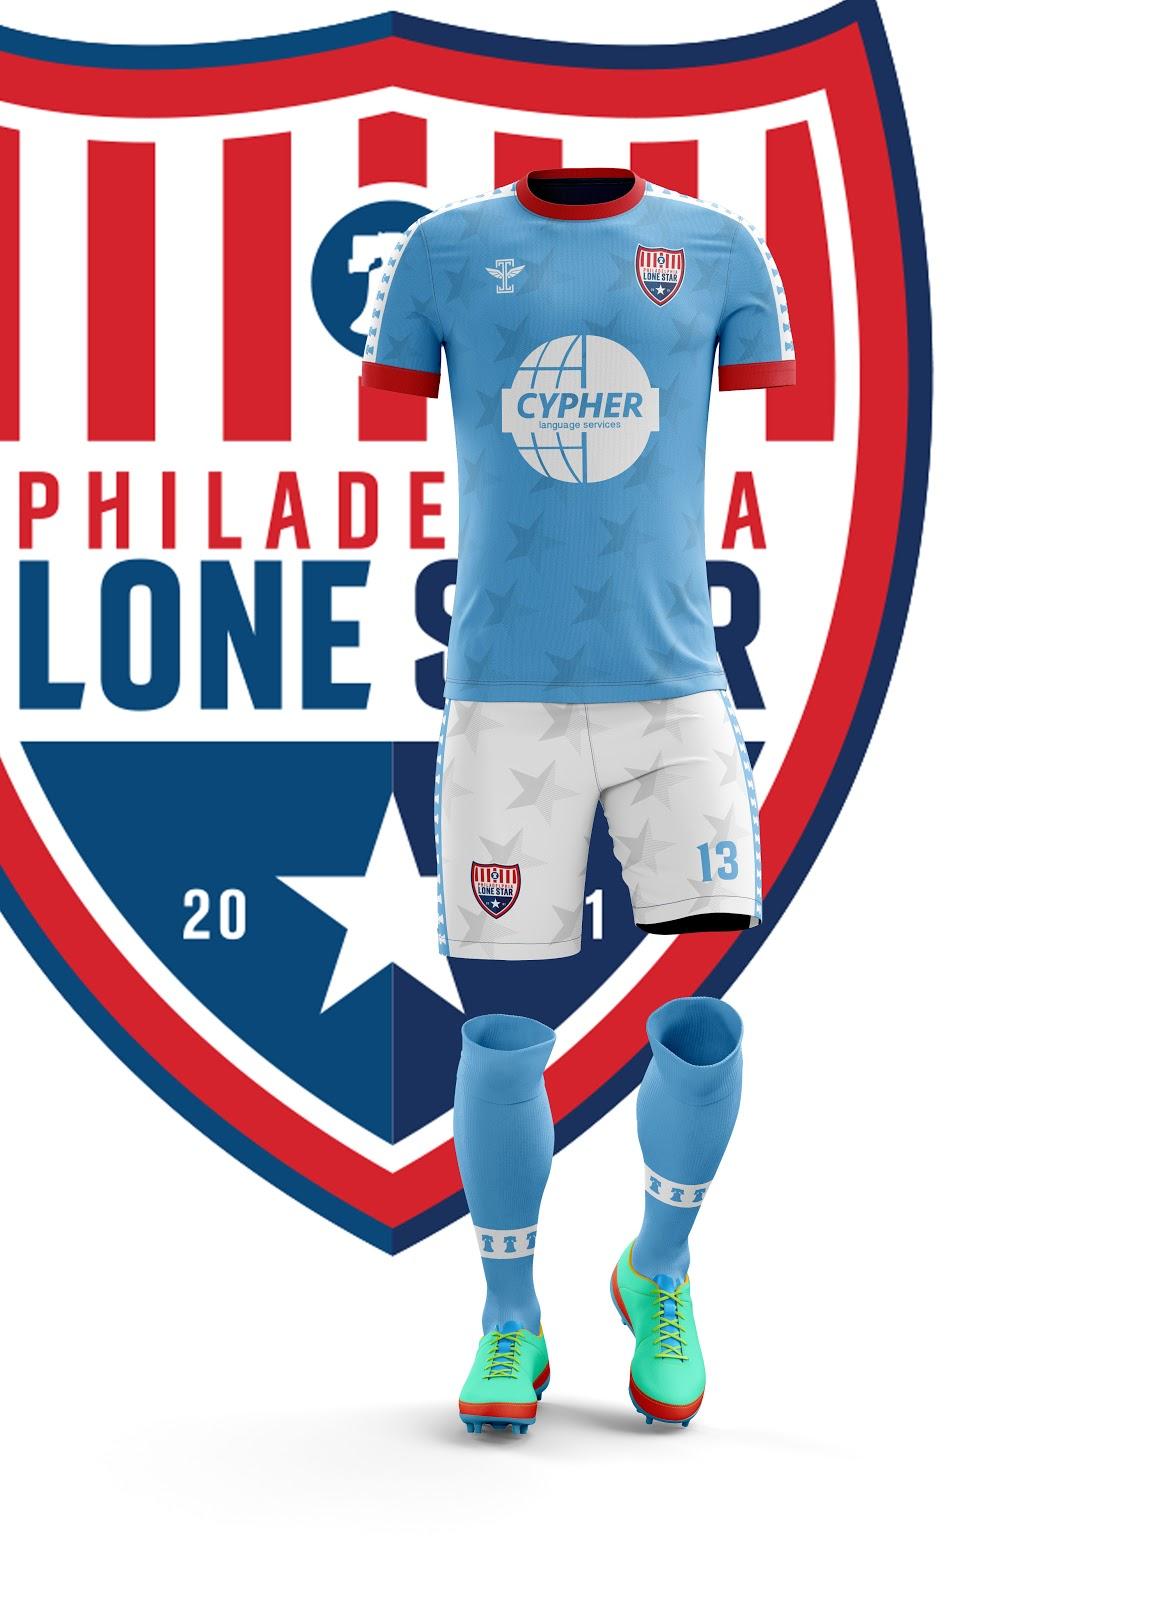 Philadelphia Lone Star Sky Blue Star Kit.jpg